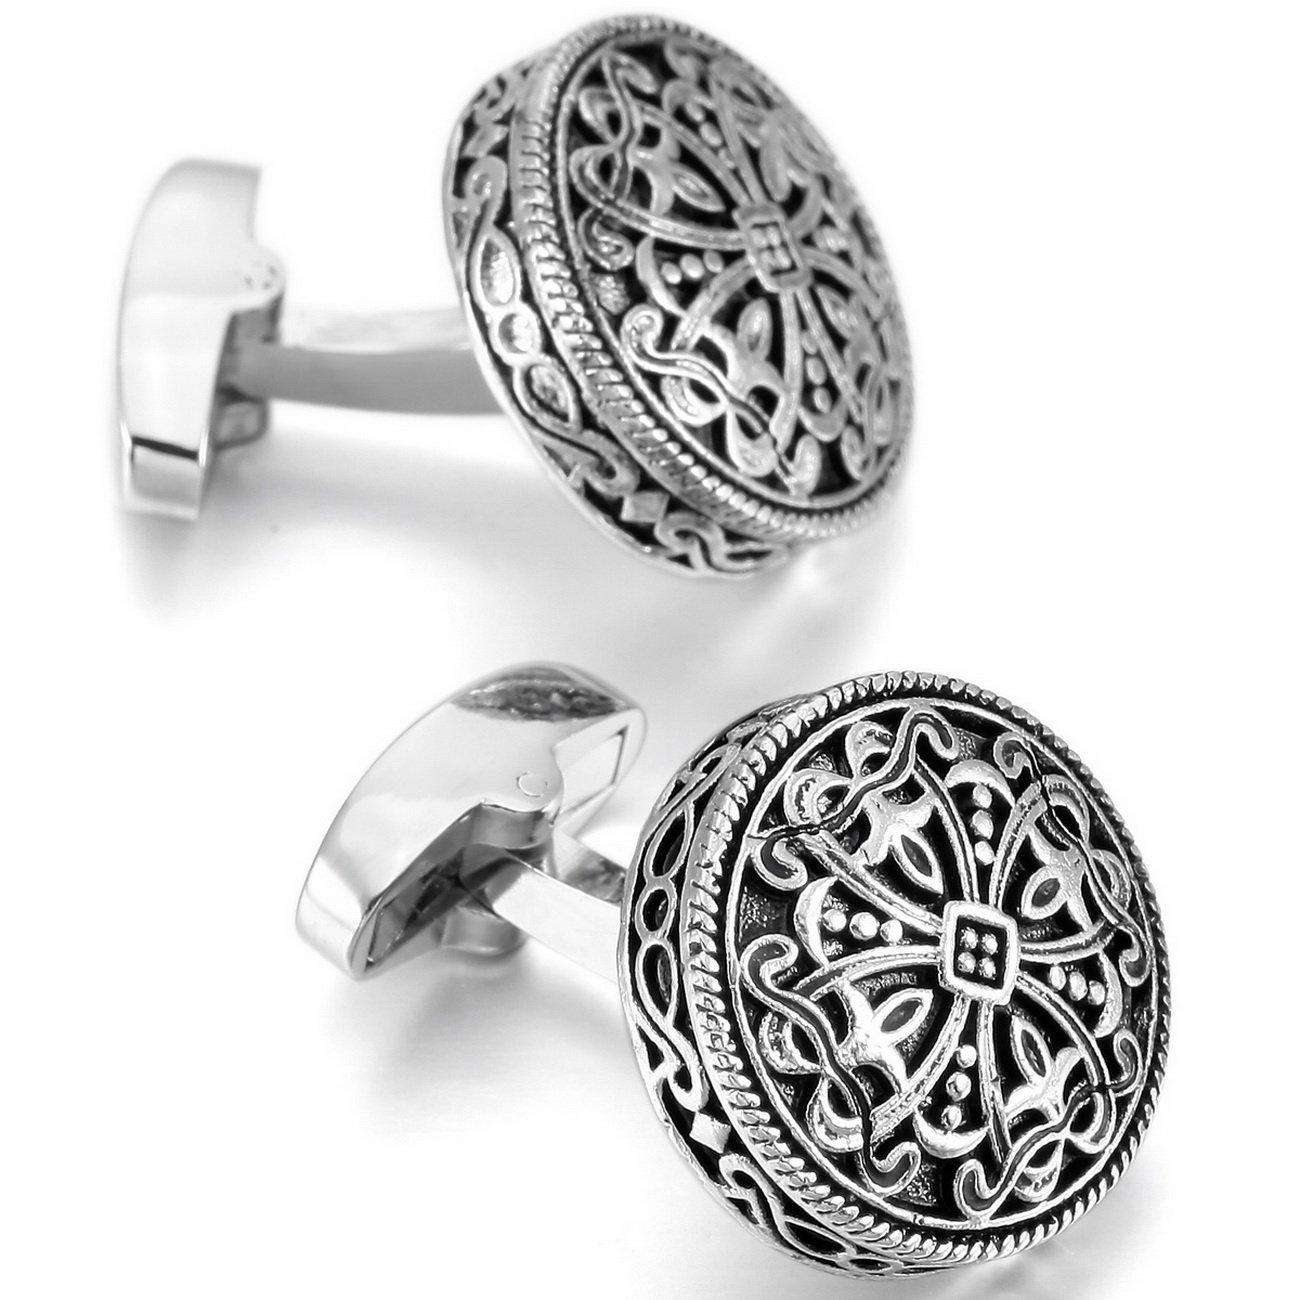 MOWOM Silver Tone Black 2PCS Rhodium Plated Cufflinks Celtic Cross Shirt Wedding Business us5050011